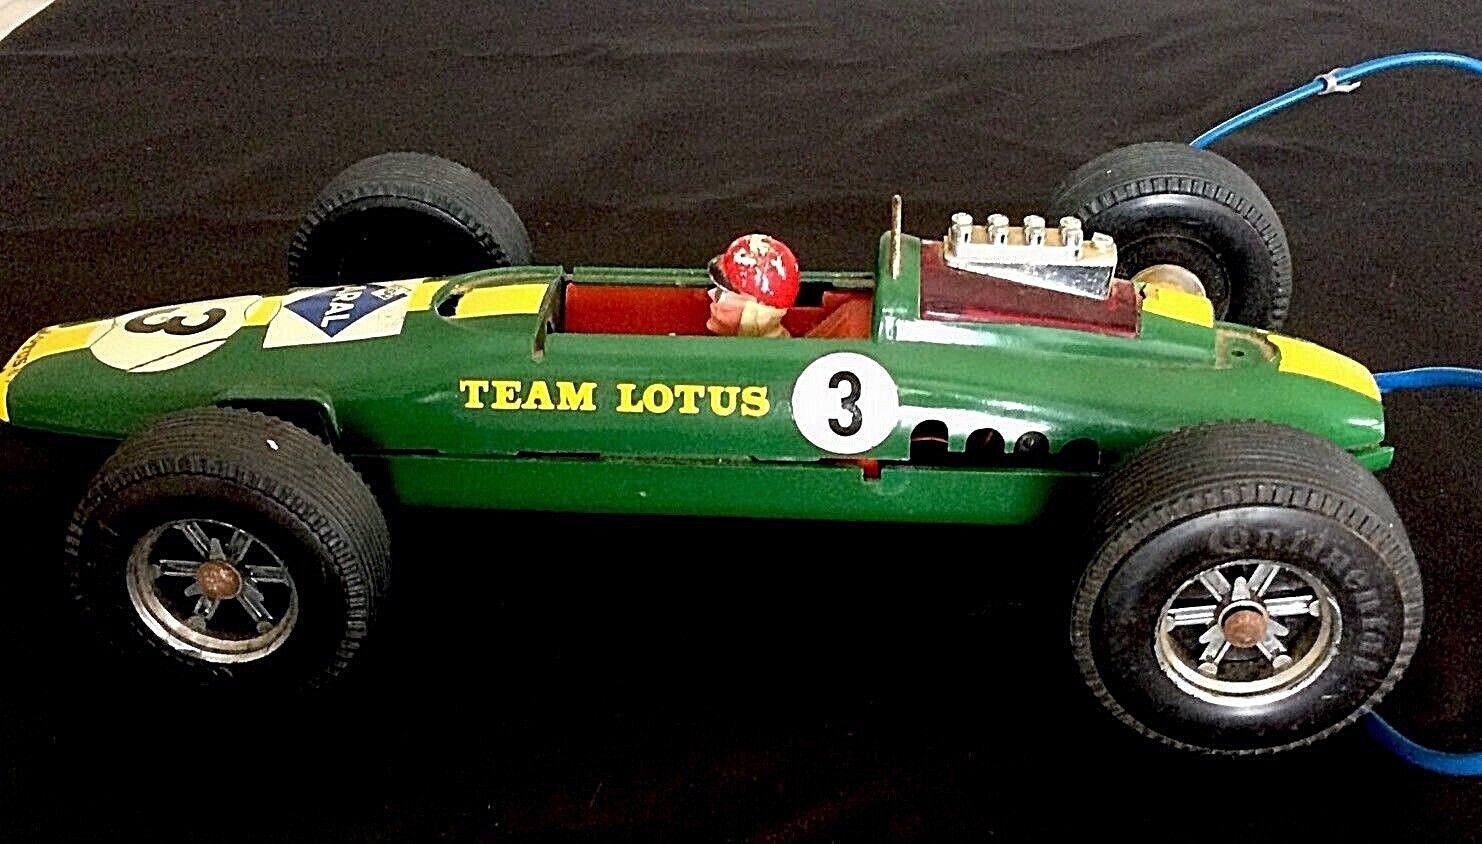 LOTUS F1 TEAM ARAL VOITURE TÉLÉGUIDÉE par GAMA  Lotus F1 Gama model car